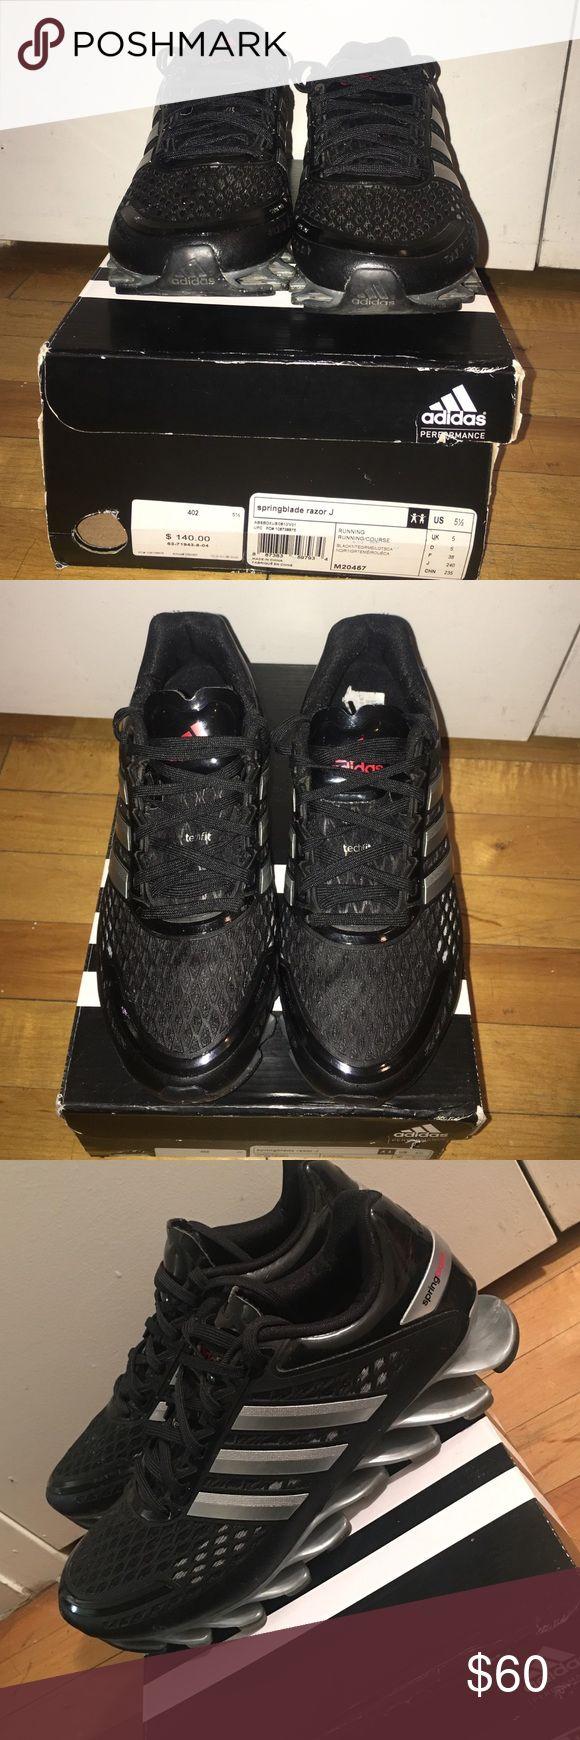 Springblade Razor Adidas *PRE OWNED* Adidas Springblade Razor Adidas Shoes Sneakers